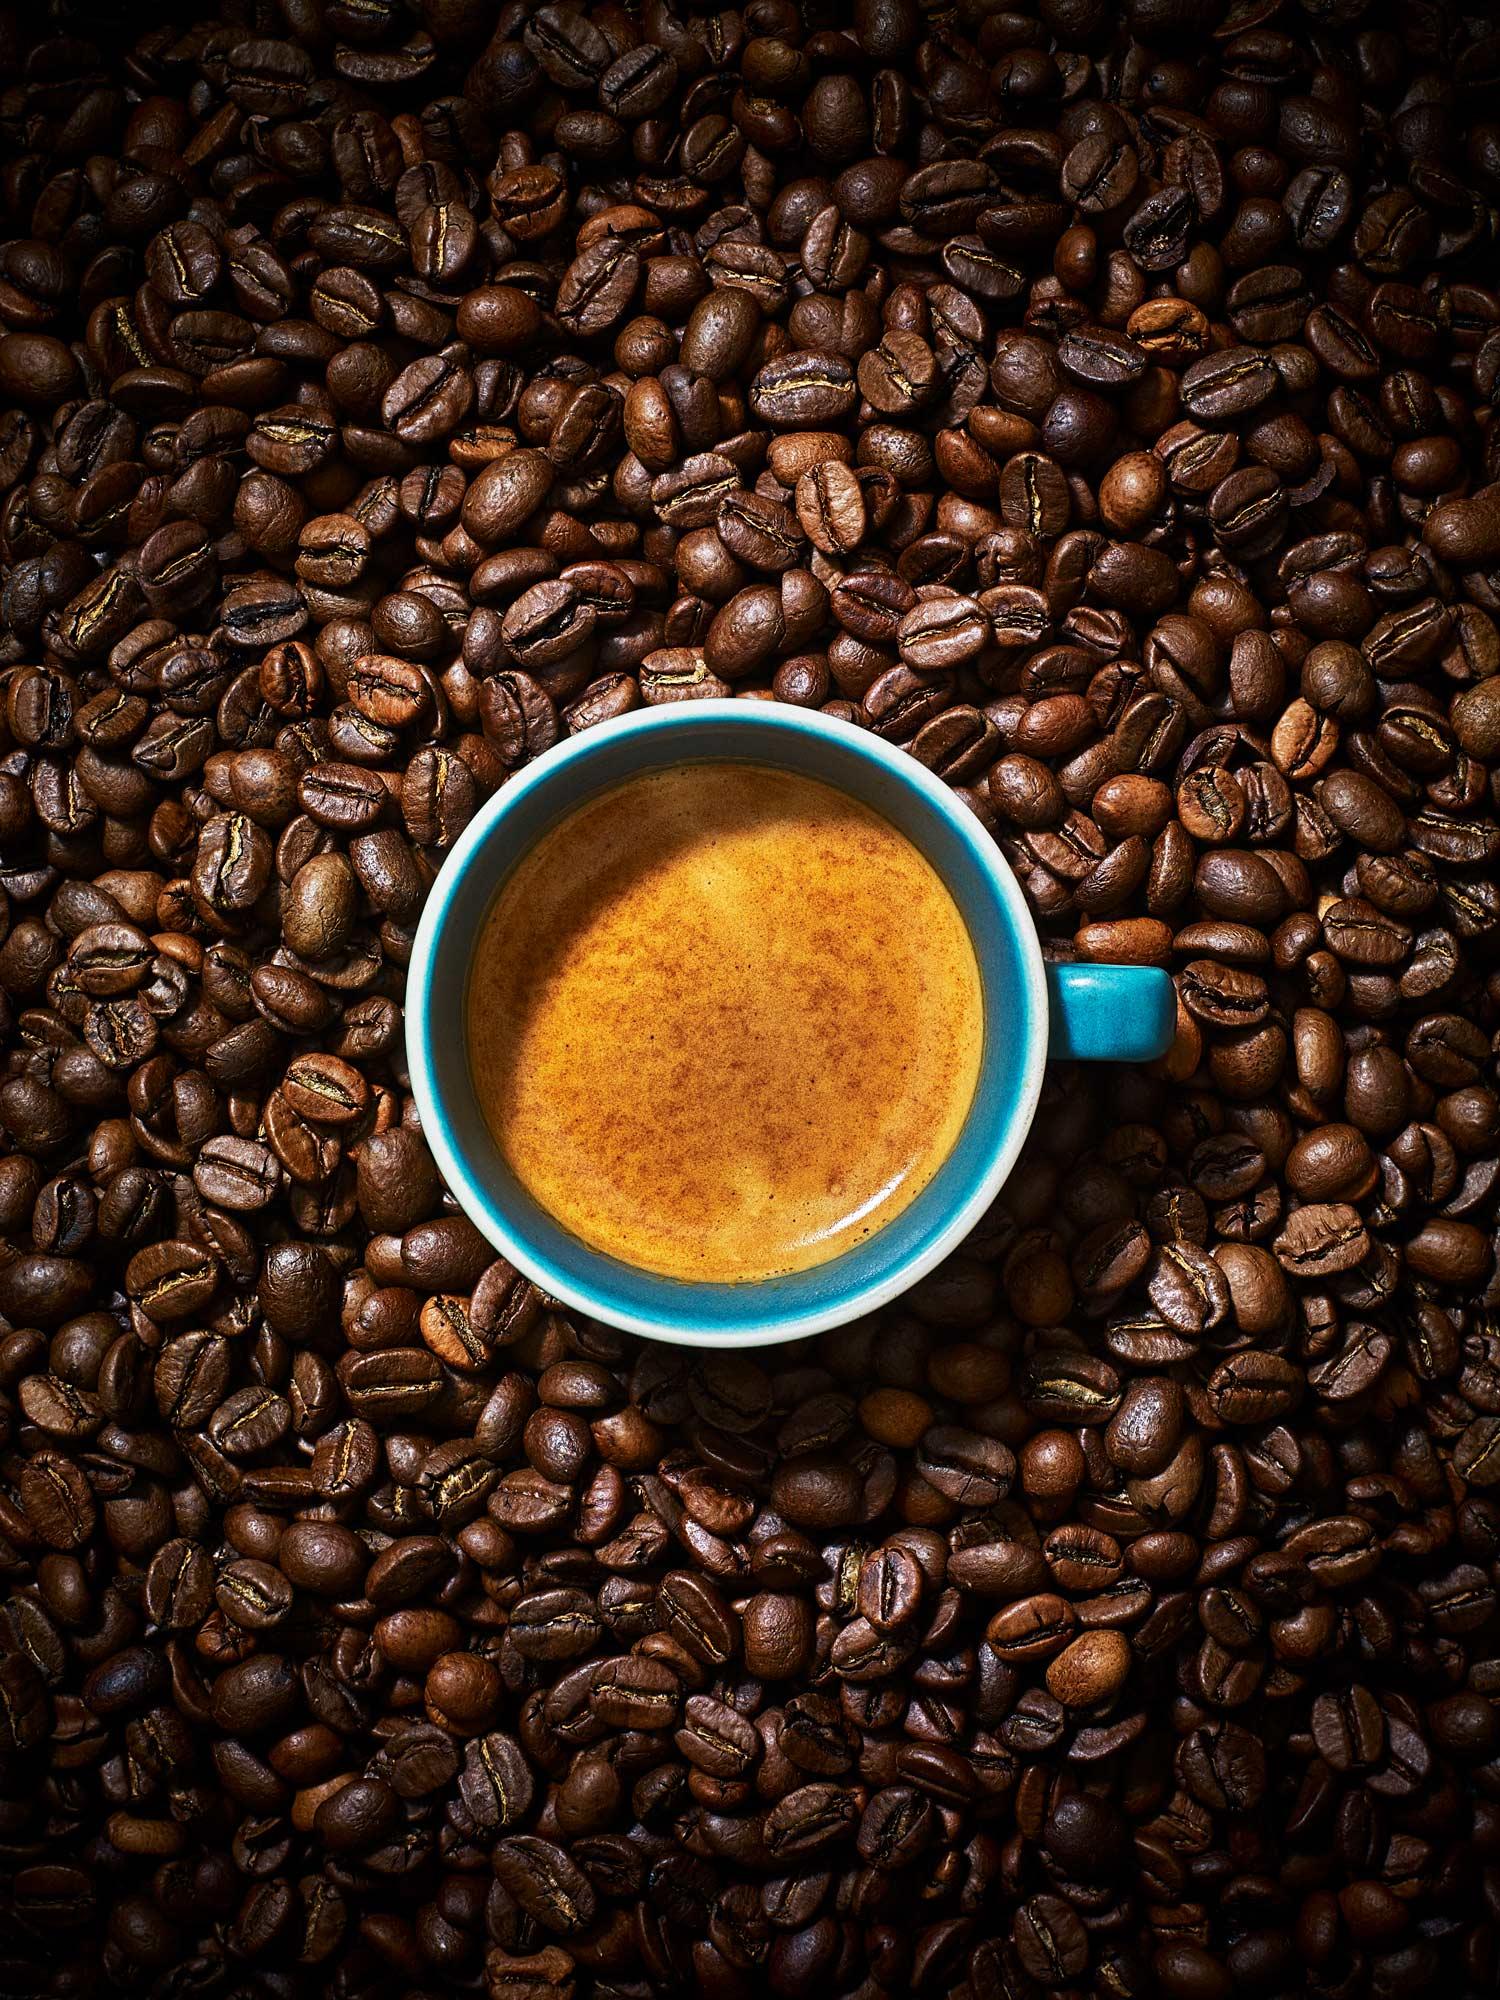 Stuart West - Coffee beans